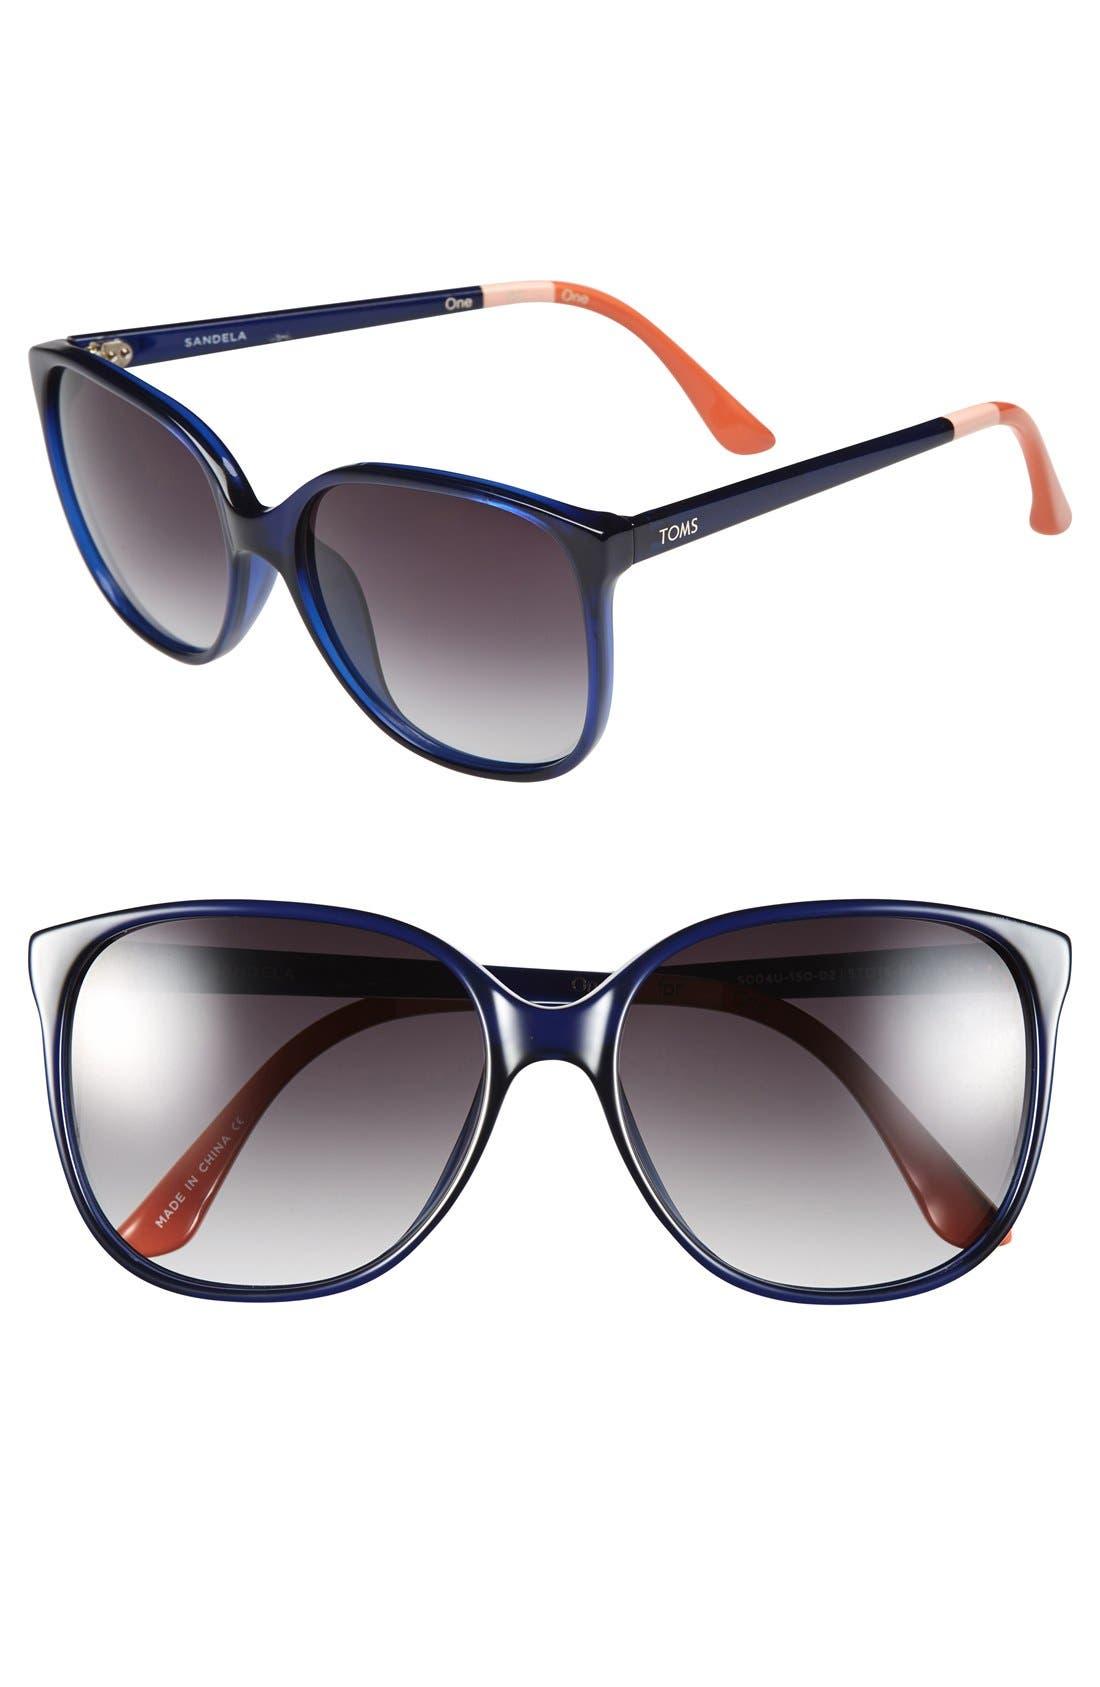 Alternate Image 1 Selected - TOMS 'Sandela' 57mm Sunglasses